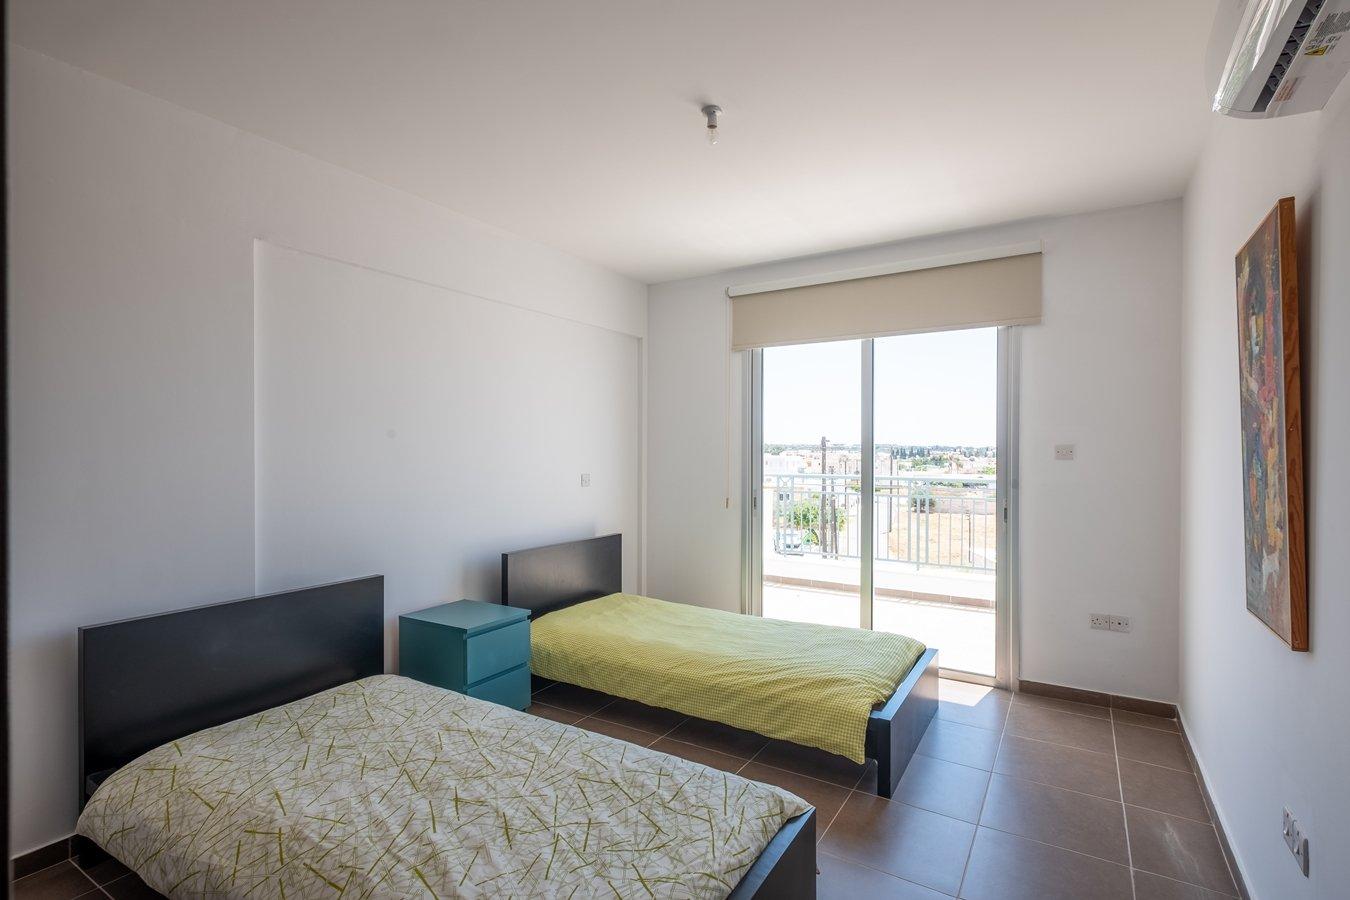 Chara-Kypria-Apartments-204-DSCF0529-HDR